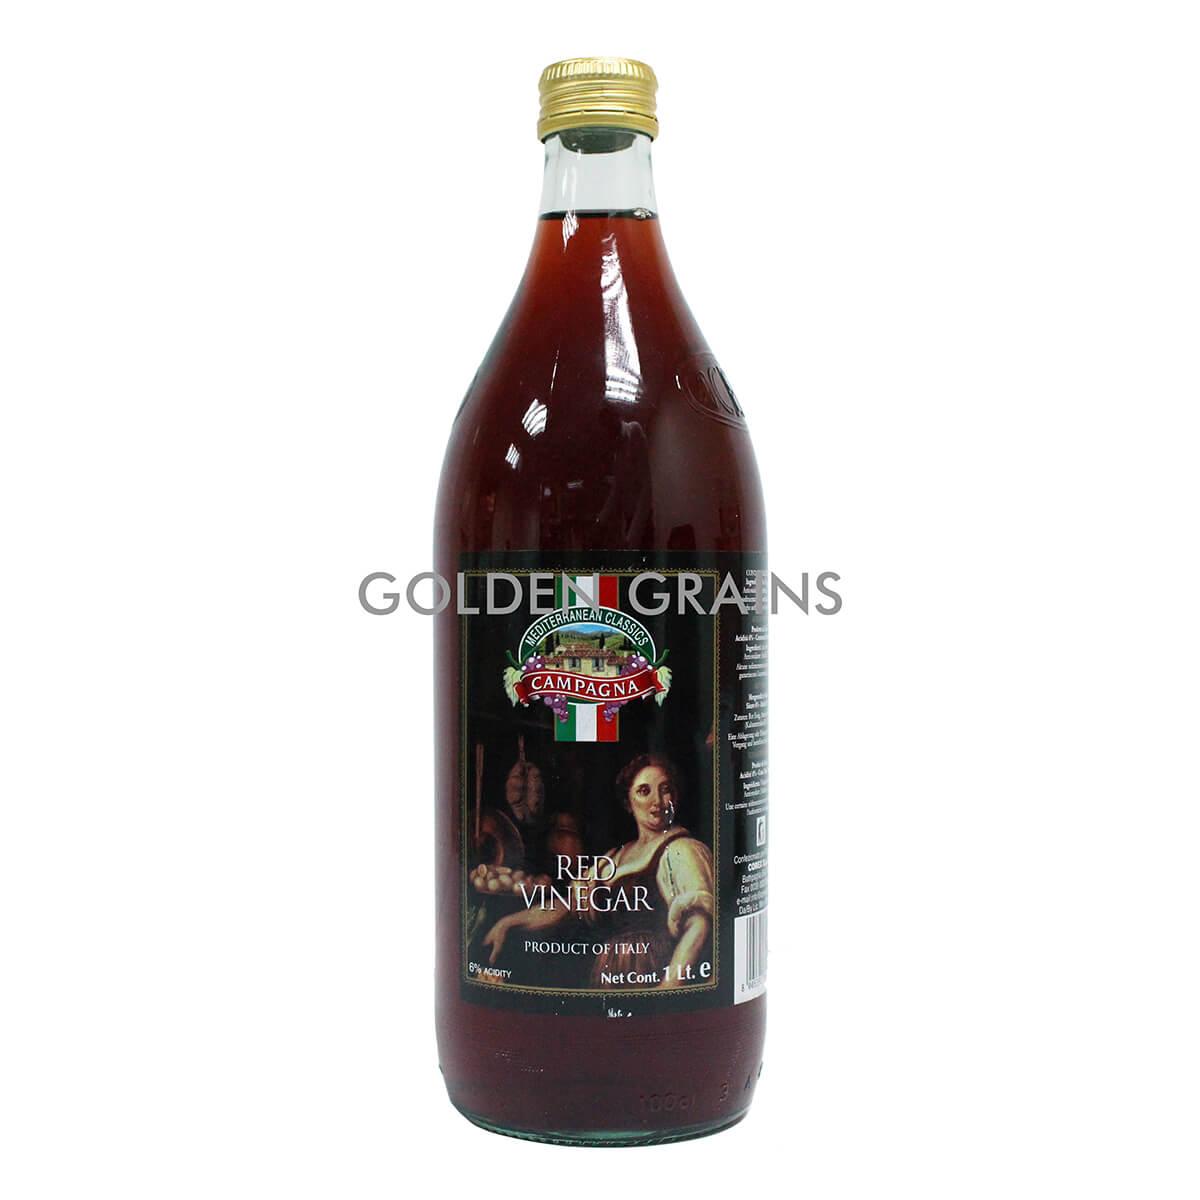 Golden Grains Campagna - Red Vinegar - 1LTR - Italy - Front.jpg